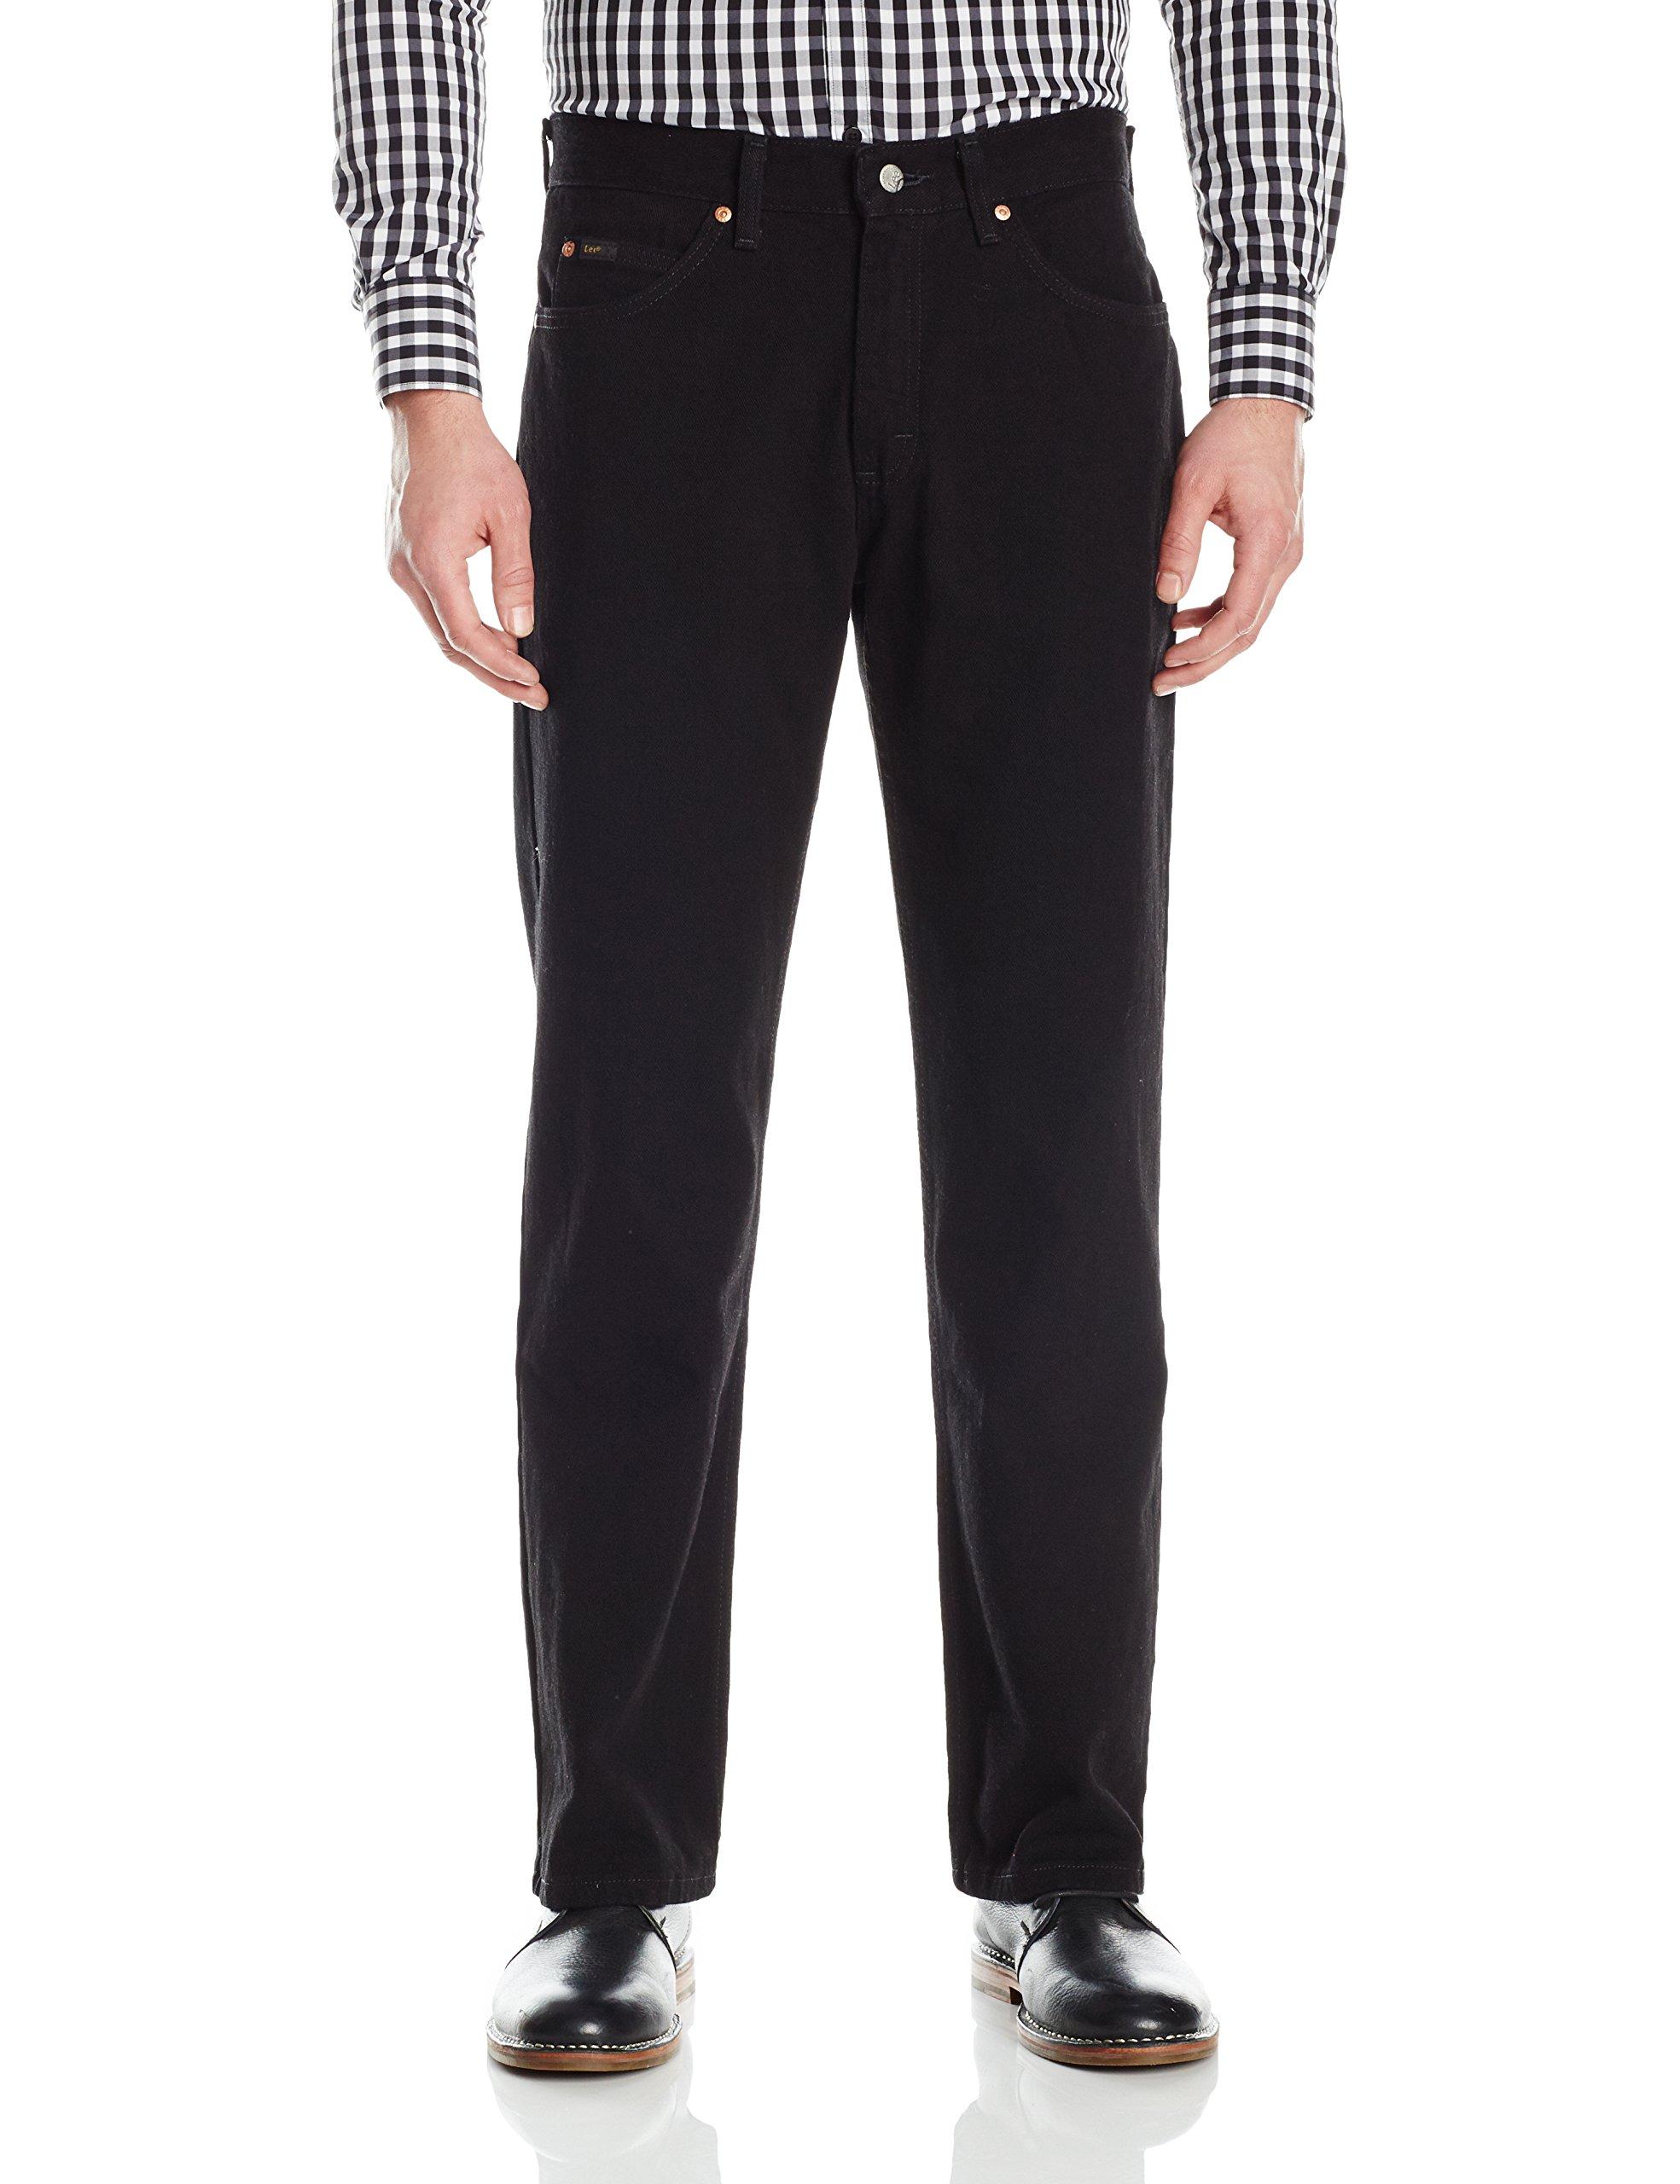 LEE Men's Regular Fit Bootcut Jean, Double Black, 33W x 32L